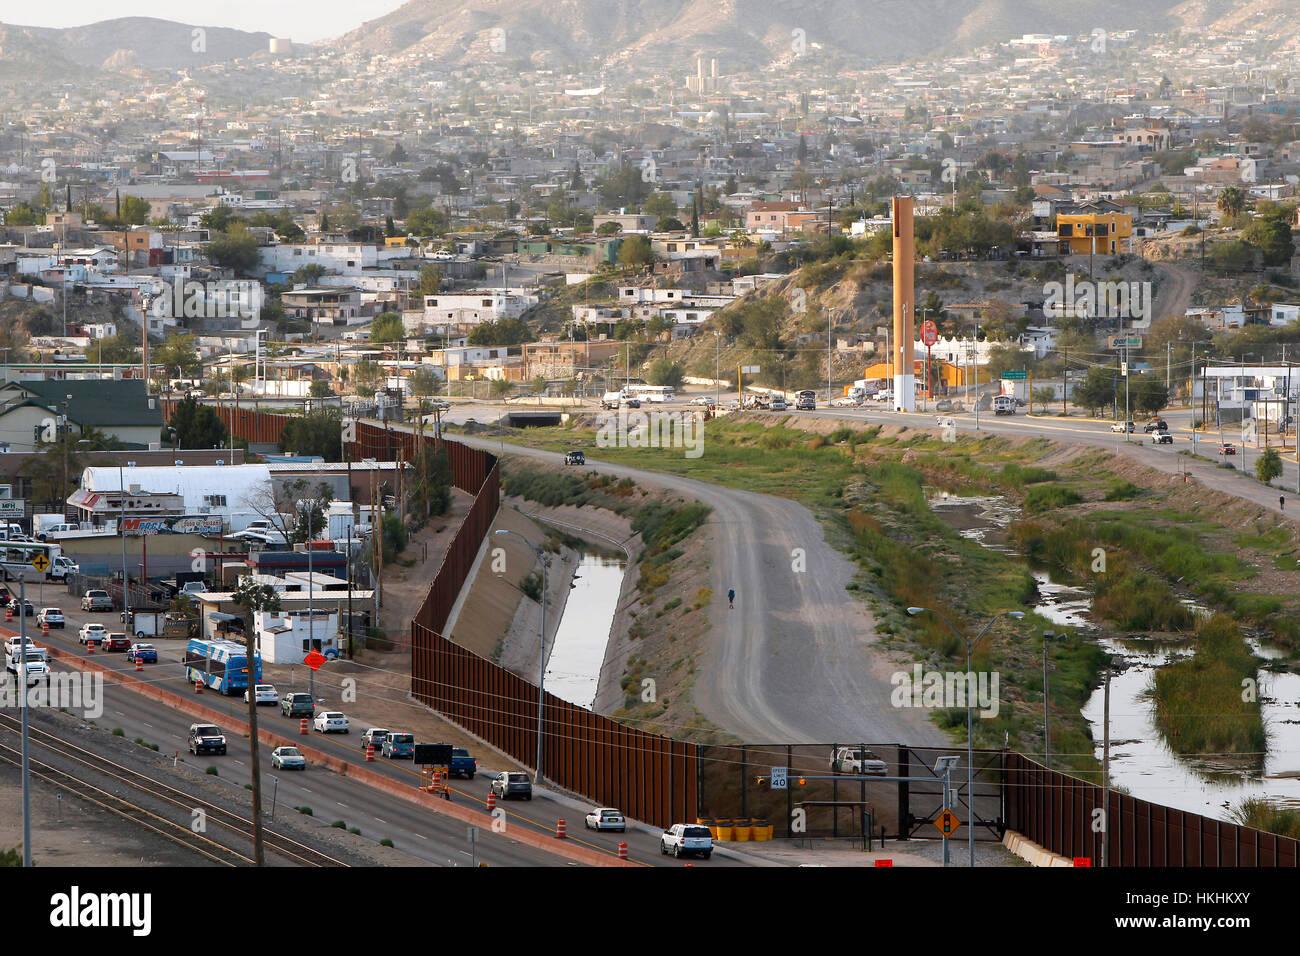 EL PASO, TX -  Colin McDonald walks inside the border fence in El Paso, Texas. SEPTEMBER 15, 2014 CREDIT: Erich Stock Photo